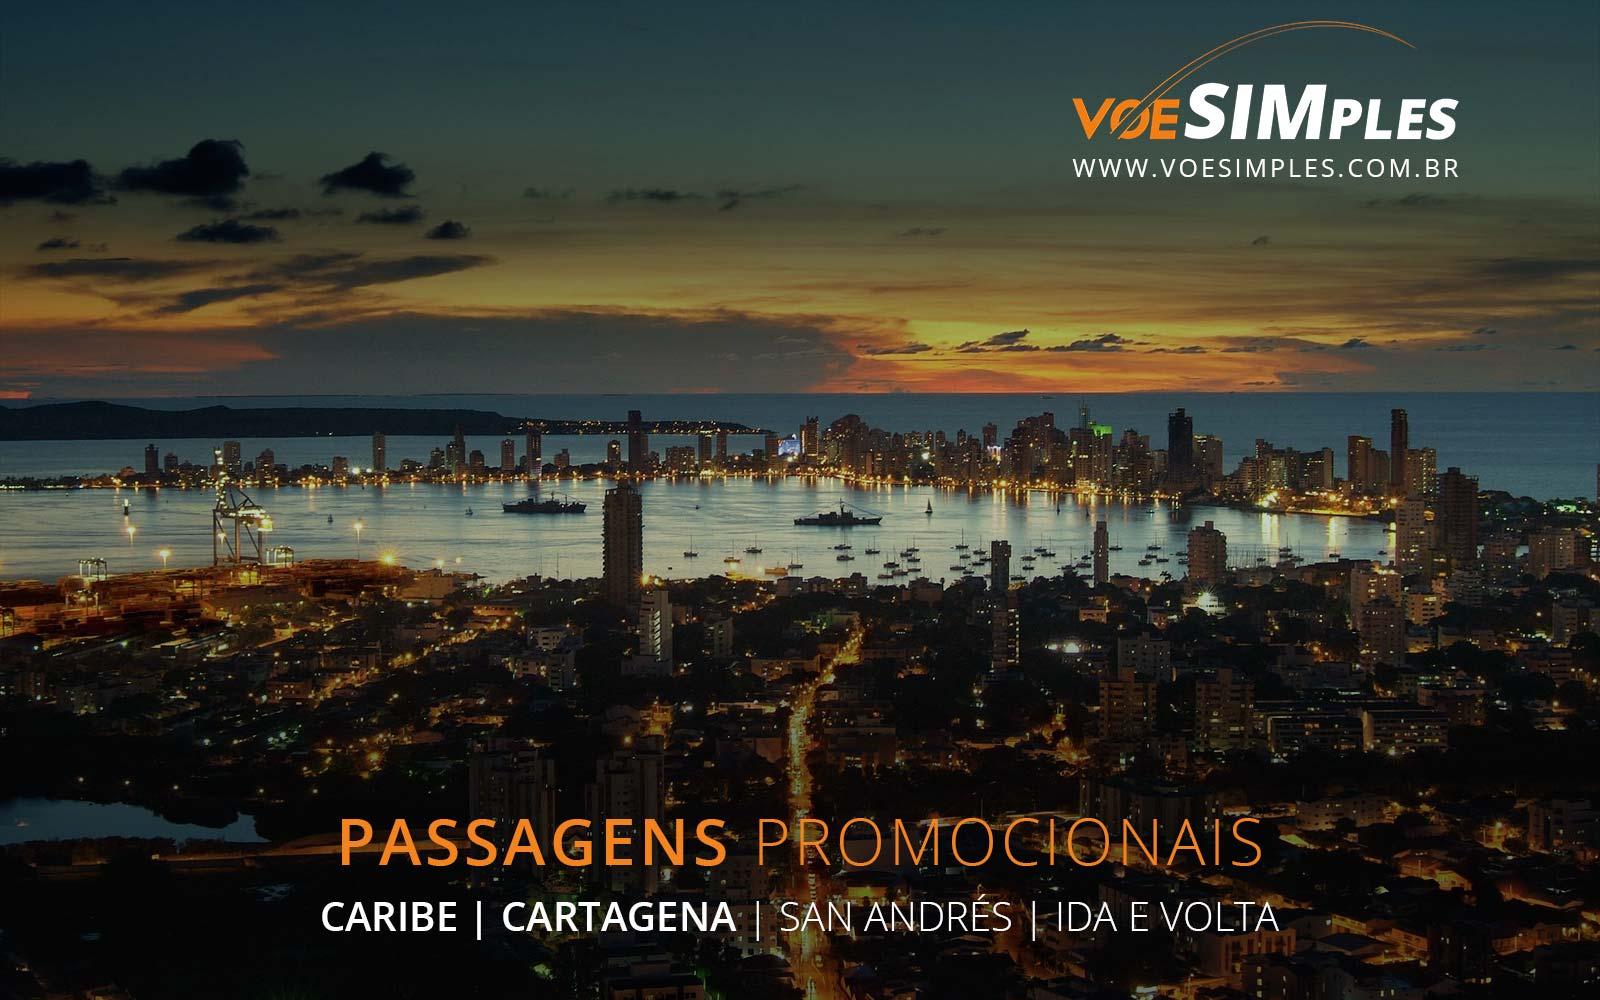 Passagens aéreas promocionais para Cartagena e San Andres no Caribe Colombiano